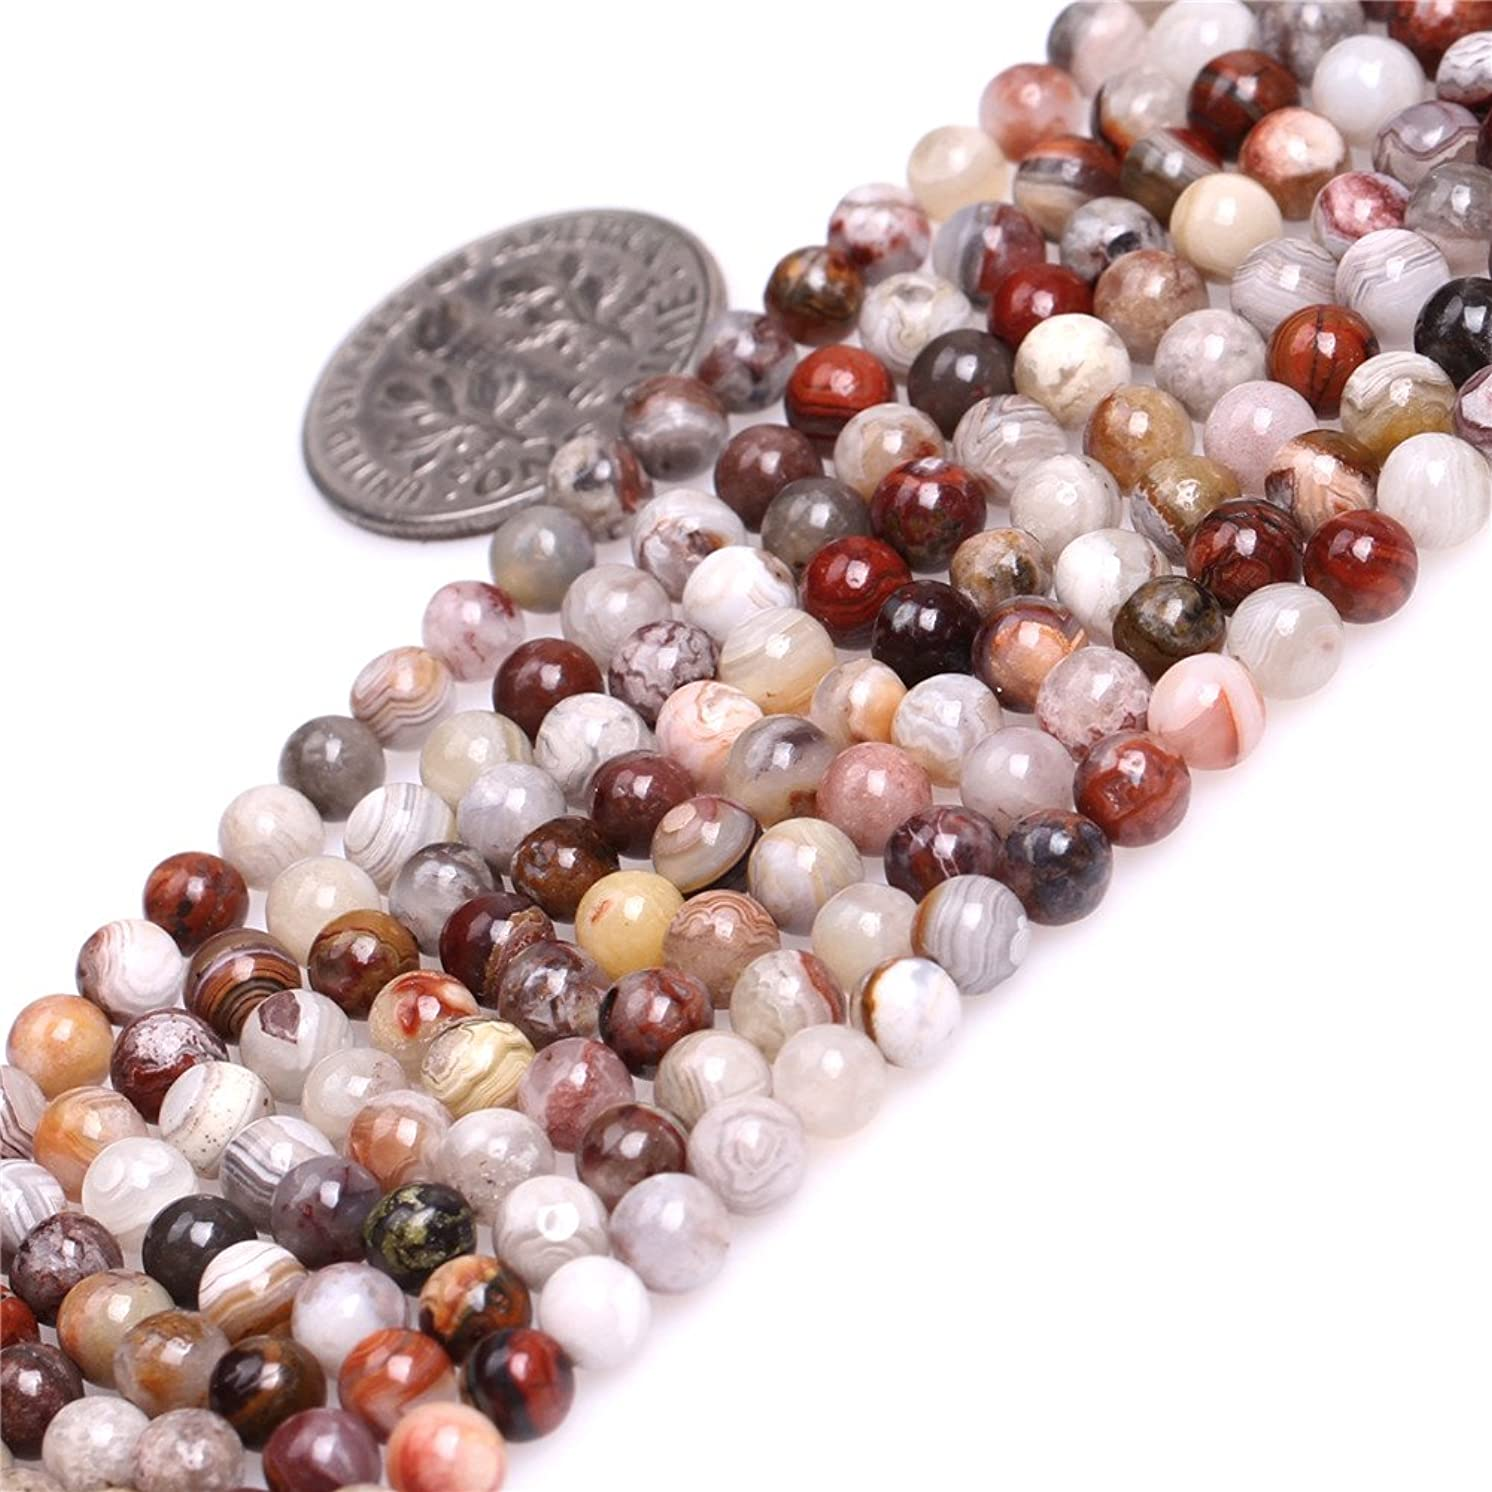 JOE FOREMAN 4mm Dark Red Mexico Laguna Lace Agate Semi Precious Gemstone Round Loose Beads for Jewelry Making DIY Handmade Craft Supplies 15